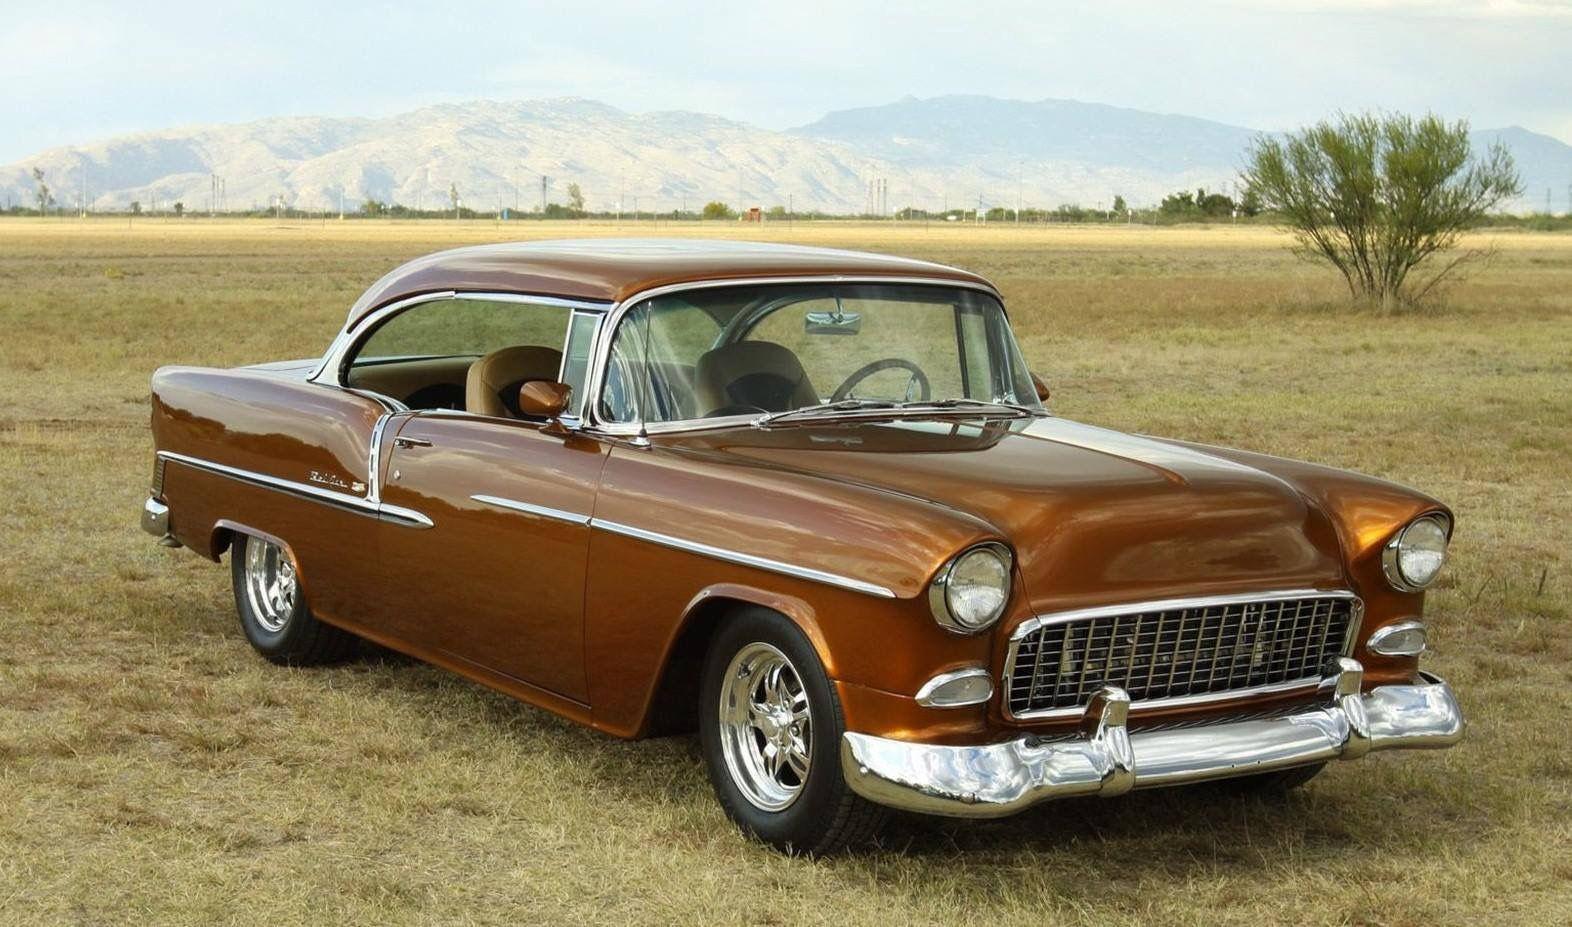 1955 Bel Air Chevrolet